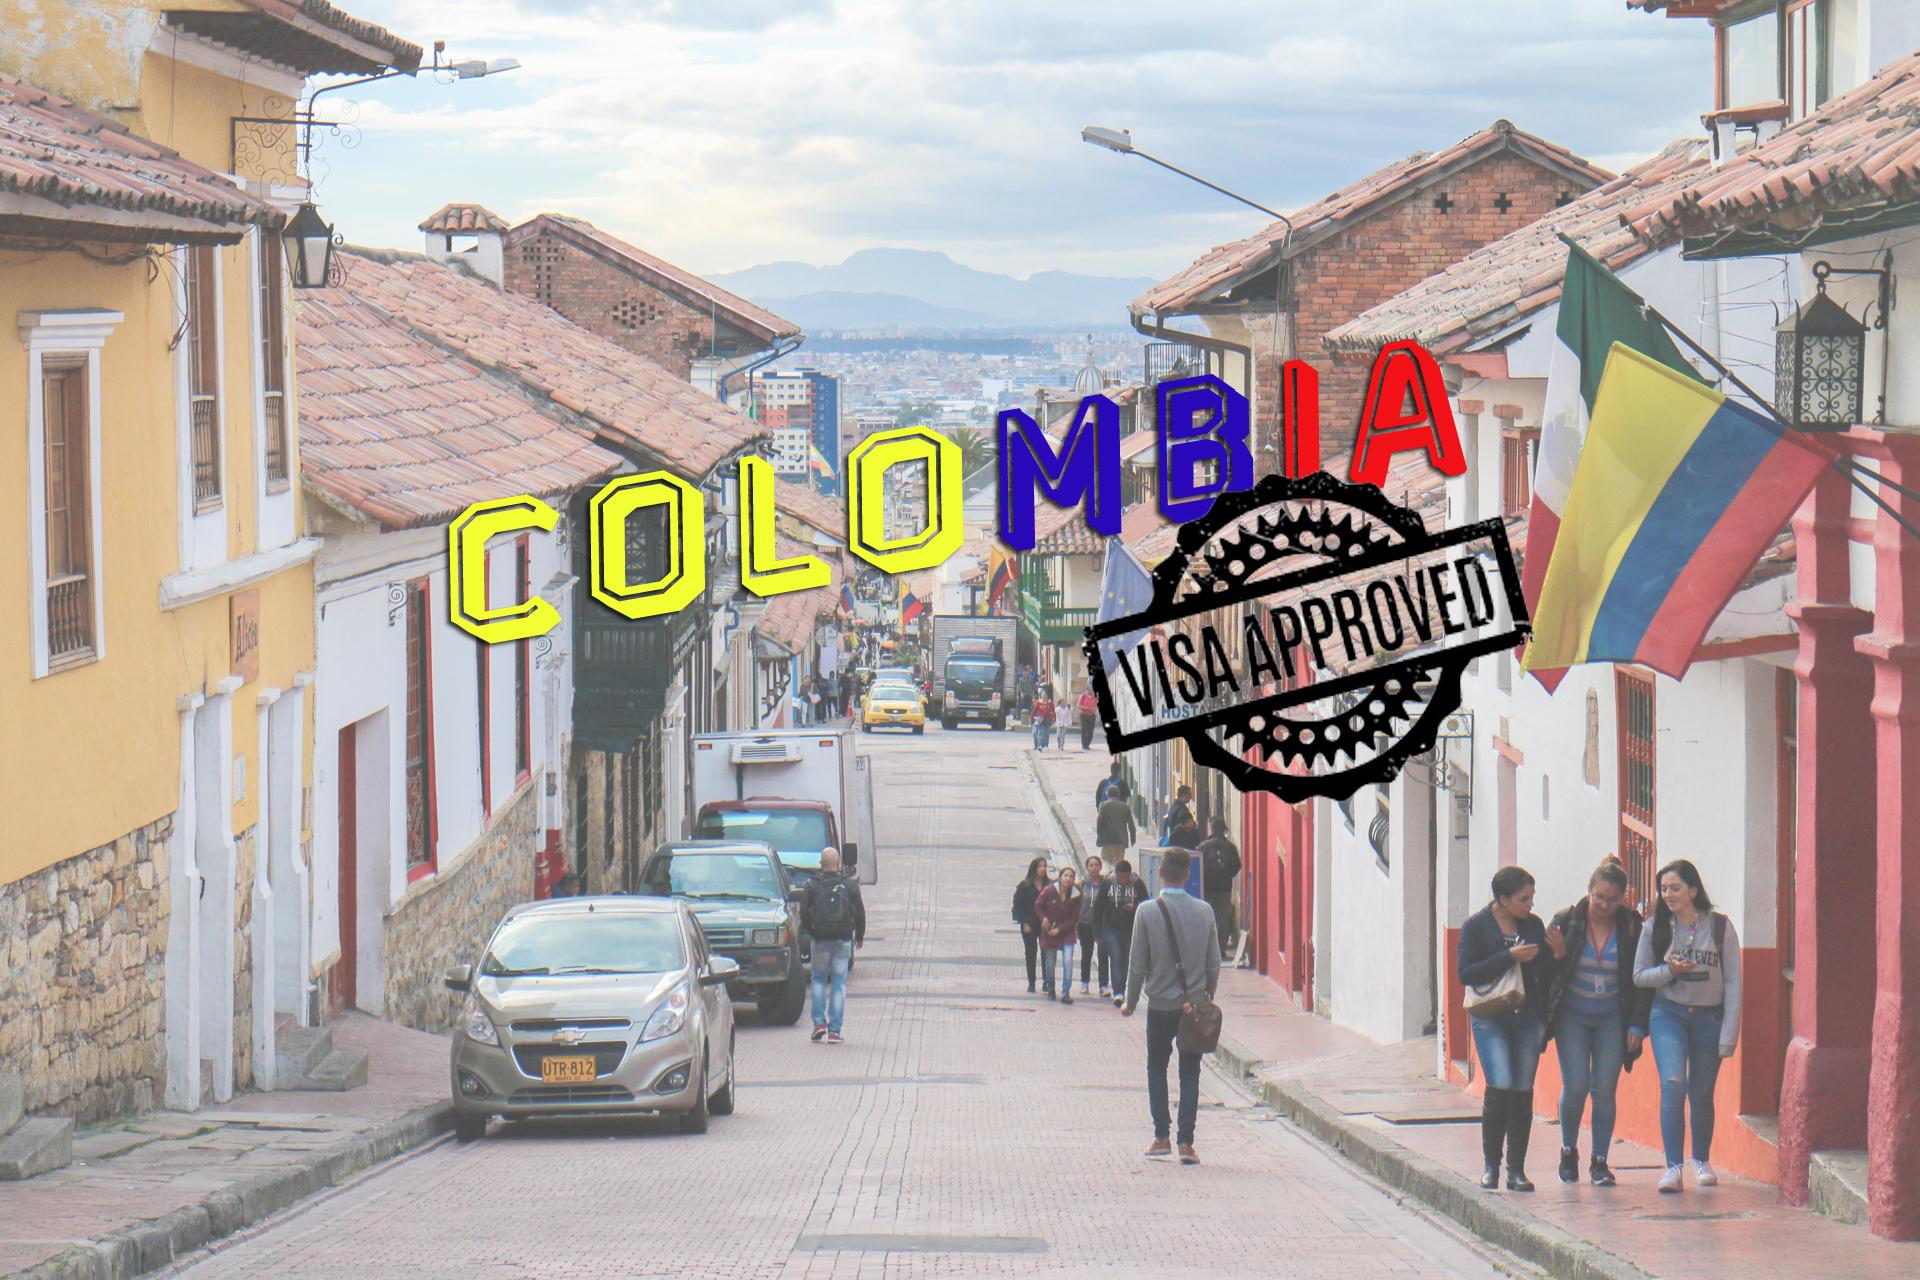 Colombia Visa ขั้นตอนการขอวีซ่า 2018